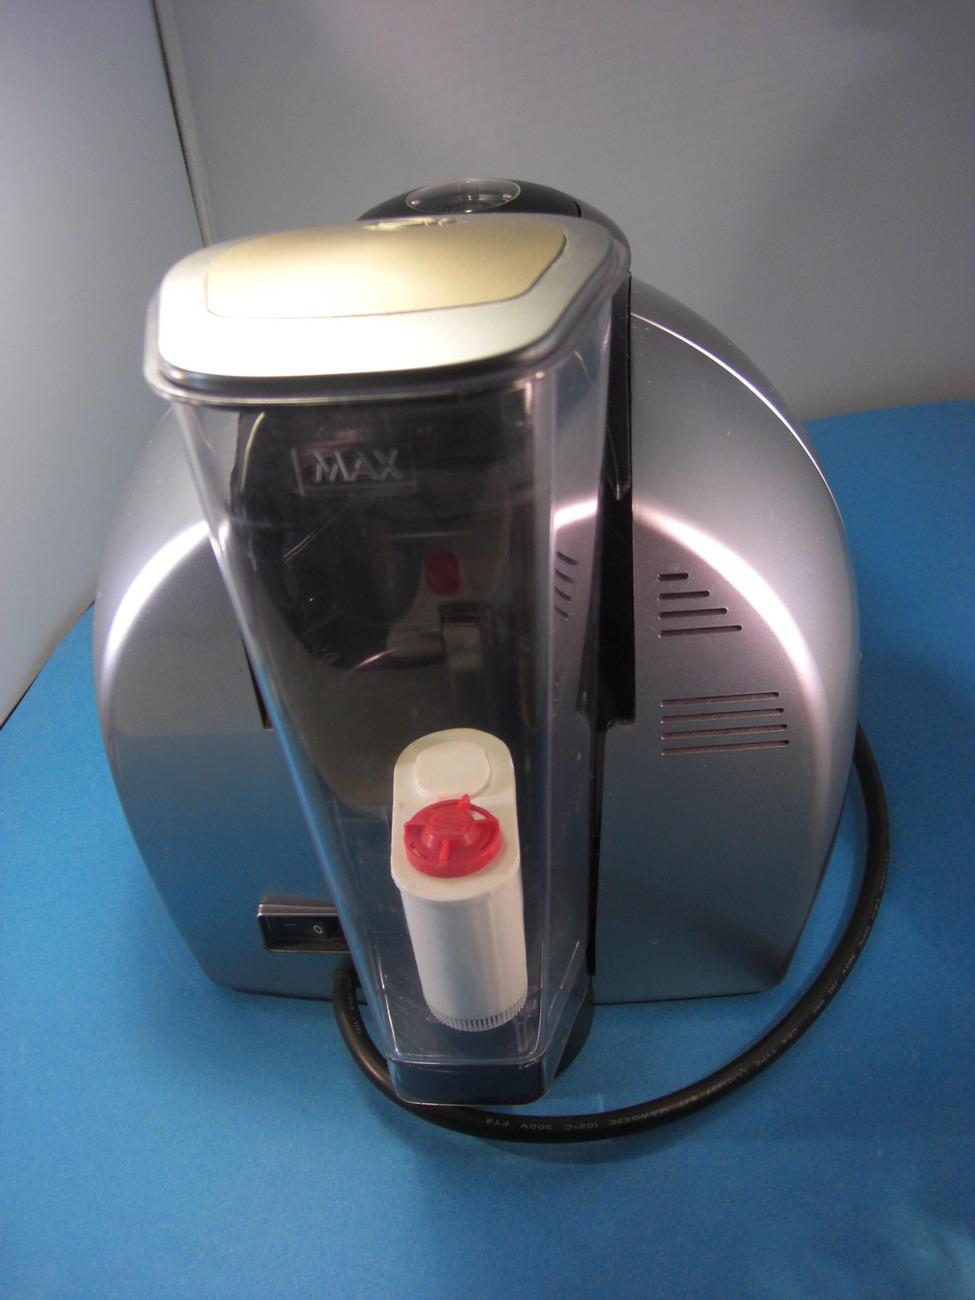 One Mug Coffee Maker Model Wm 6101 : Braun Tassimo One Cup Coffee Maker Model 3107 - Coffee Makers